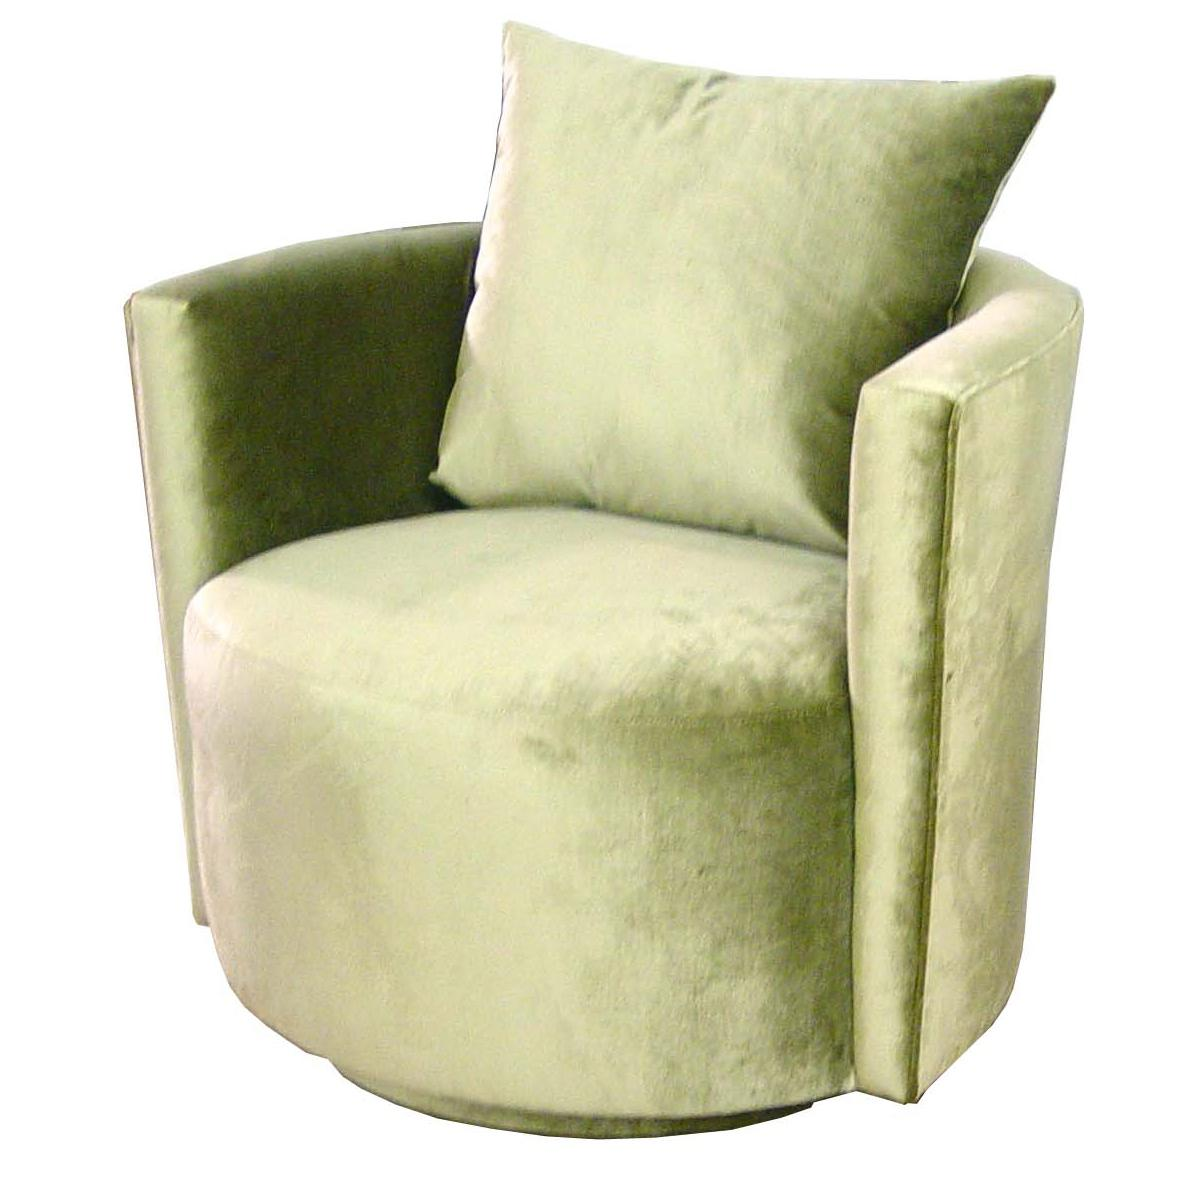 Spectrum Swivel Chair at Williams & Kay